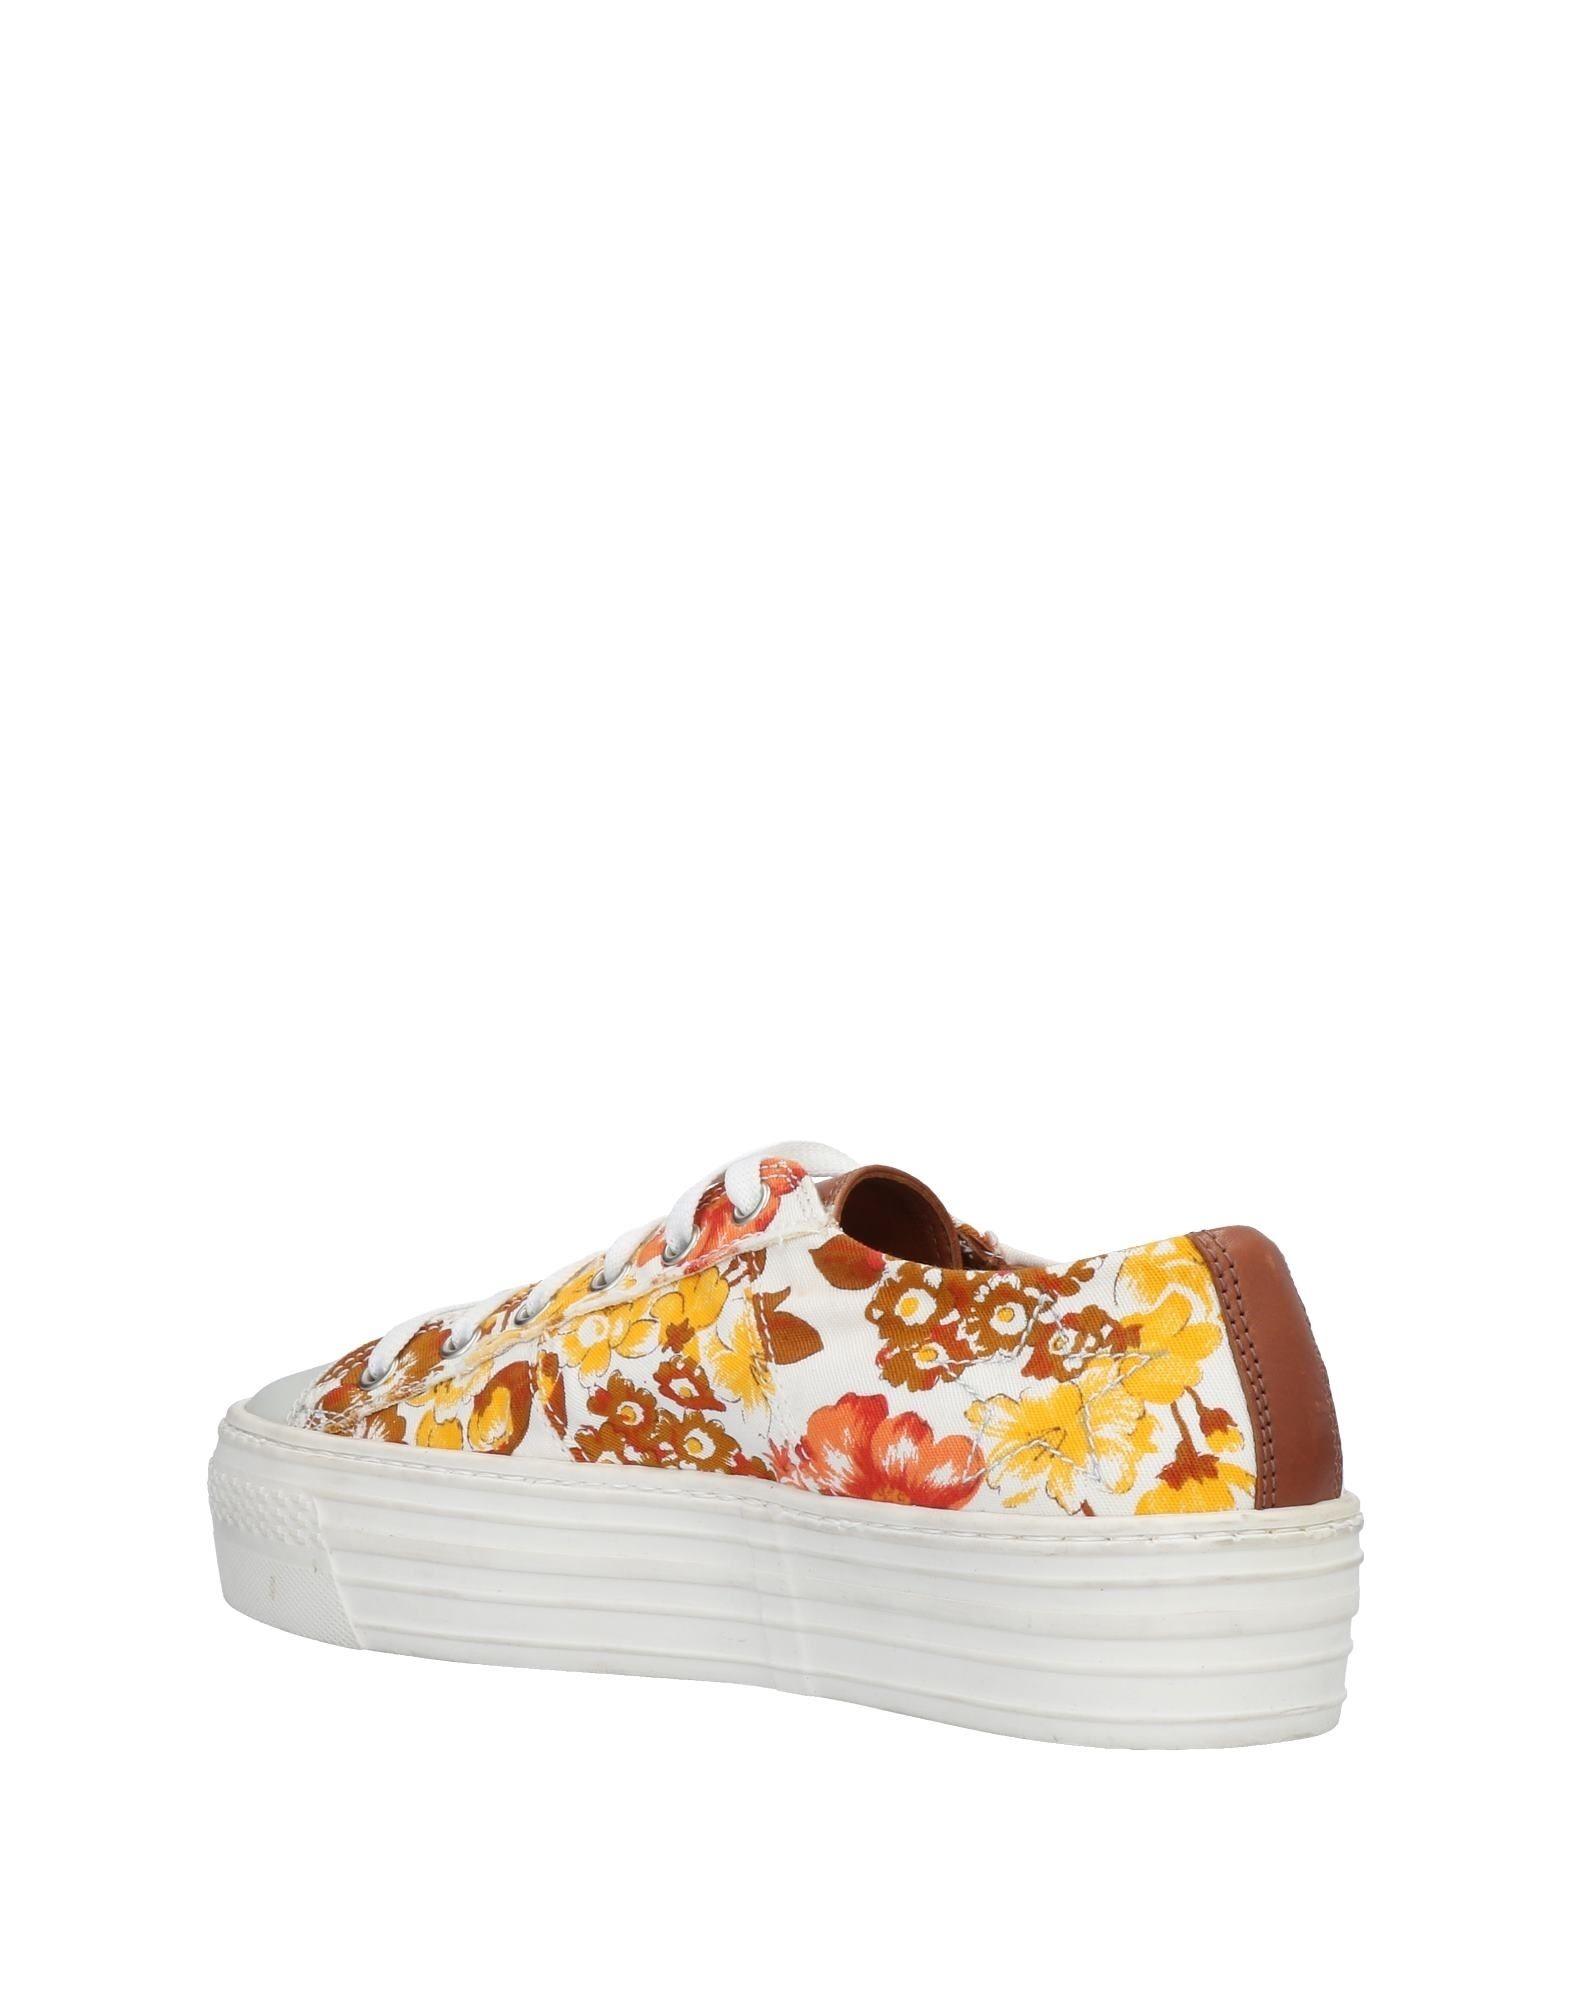 Stilvolle billige Schuhe Damen Atos Lombardini Sneakers Damen Schuhe  11491442DH 7842e4